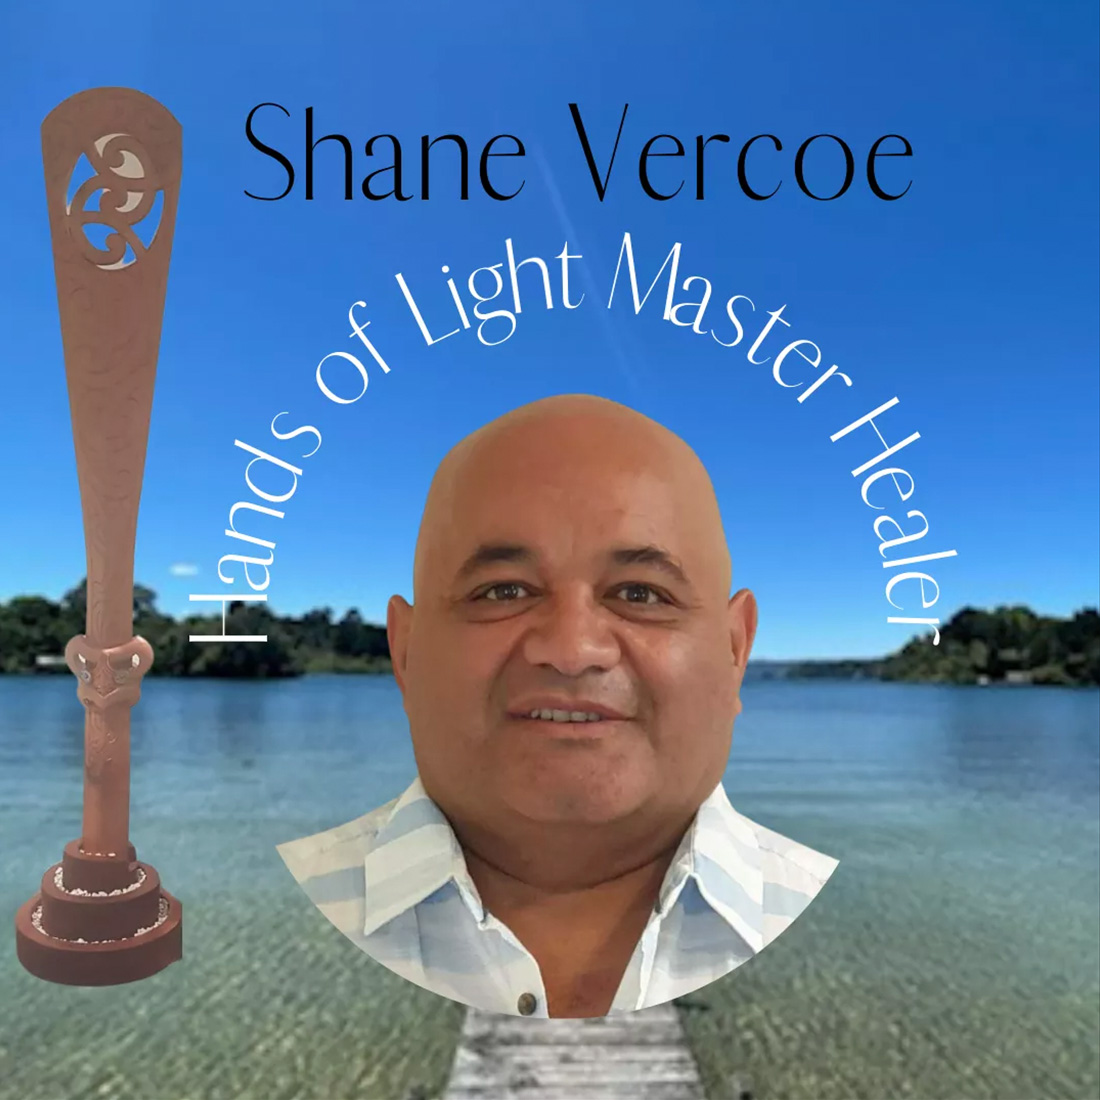 Shane Vercoe